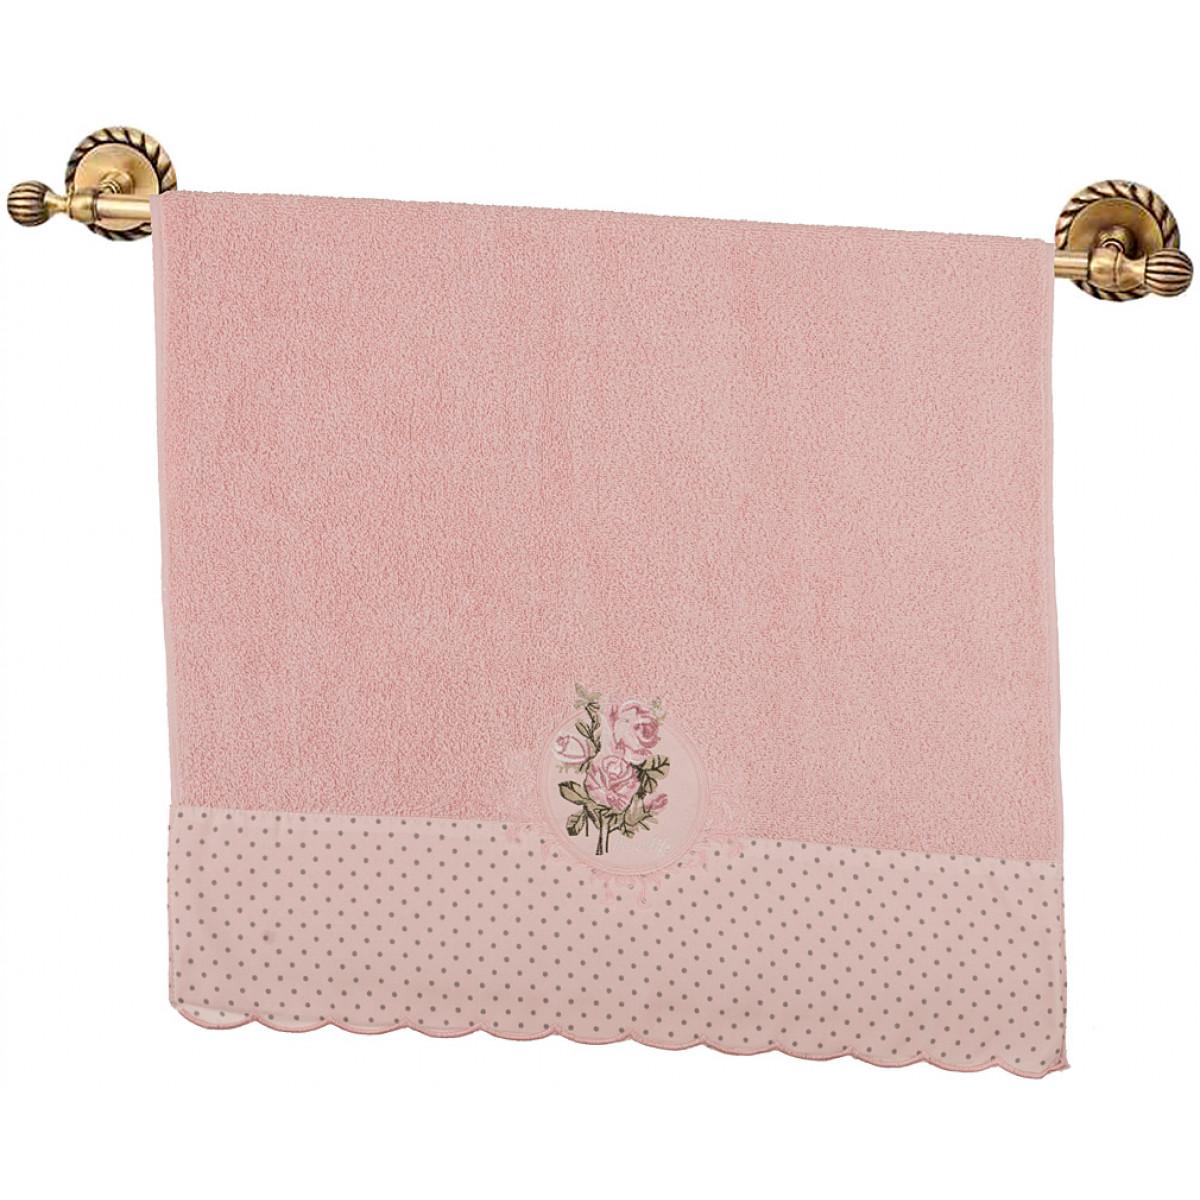 Полотенца Santalino Полотенце Dacey  (70х140 см) полотенца santalino полотенце shulamite 40х70 см